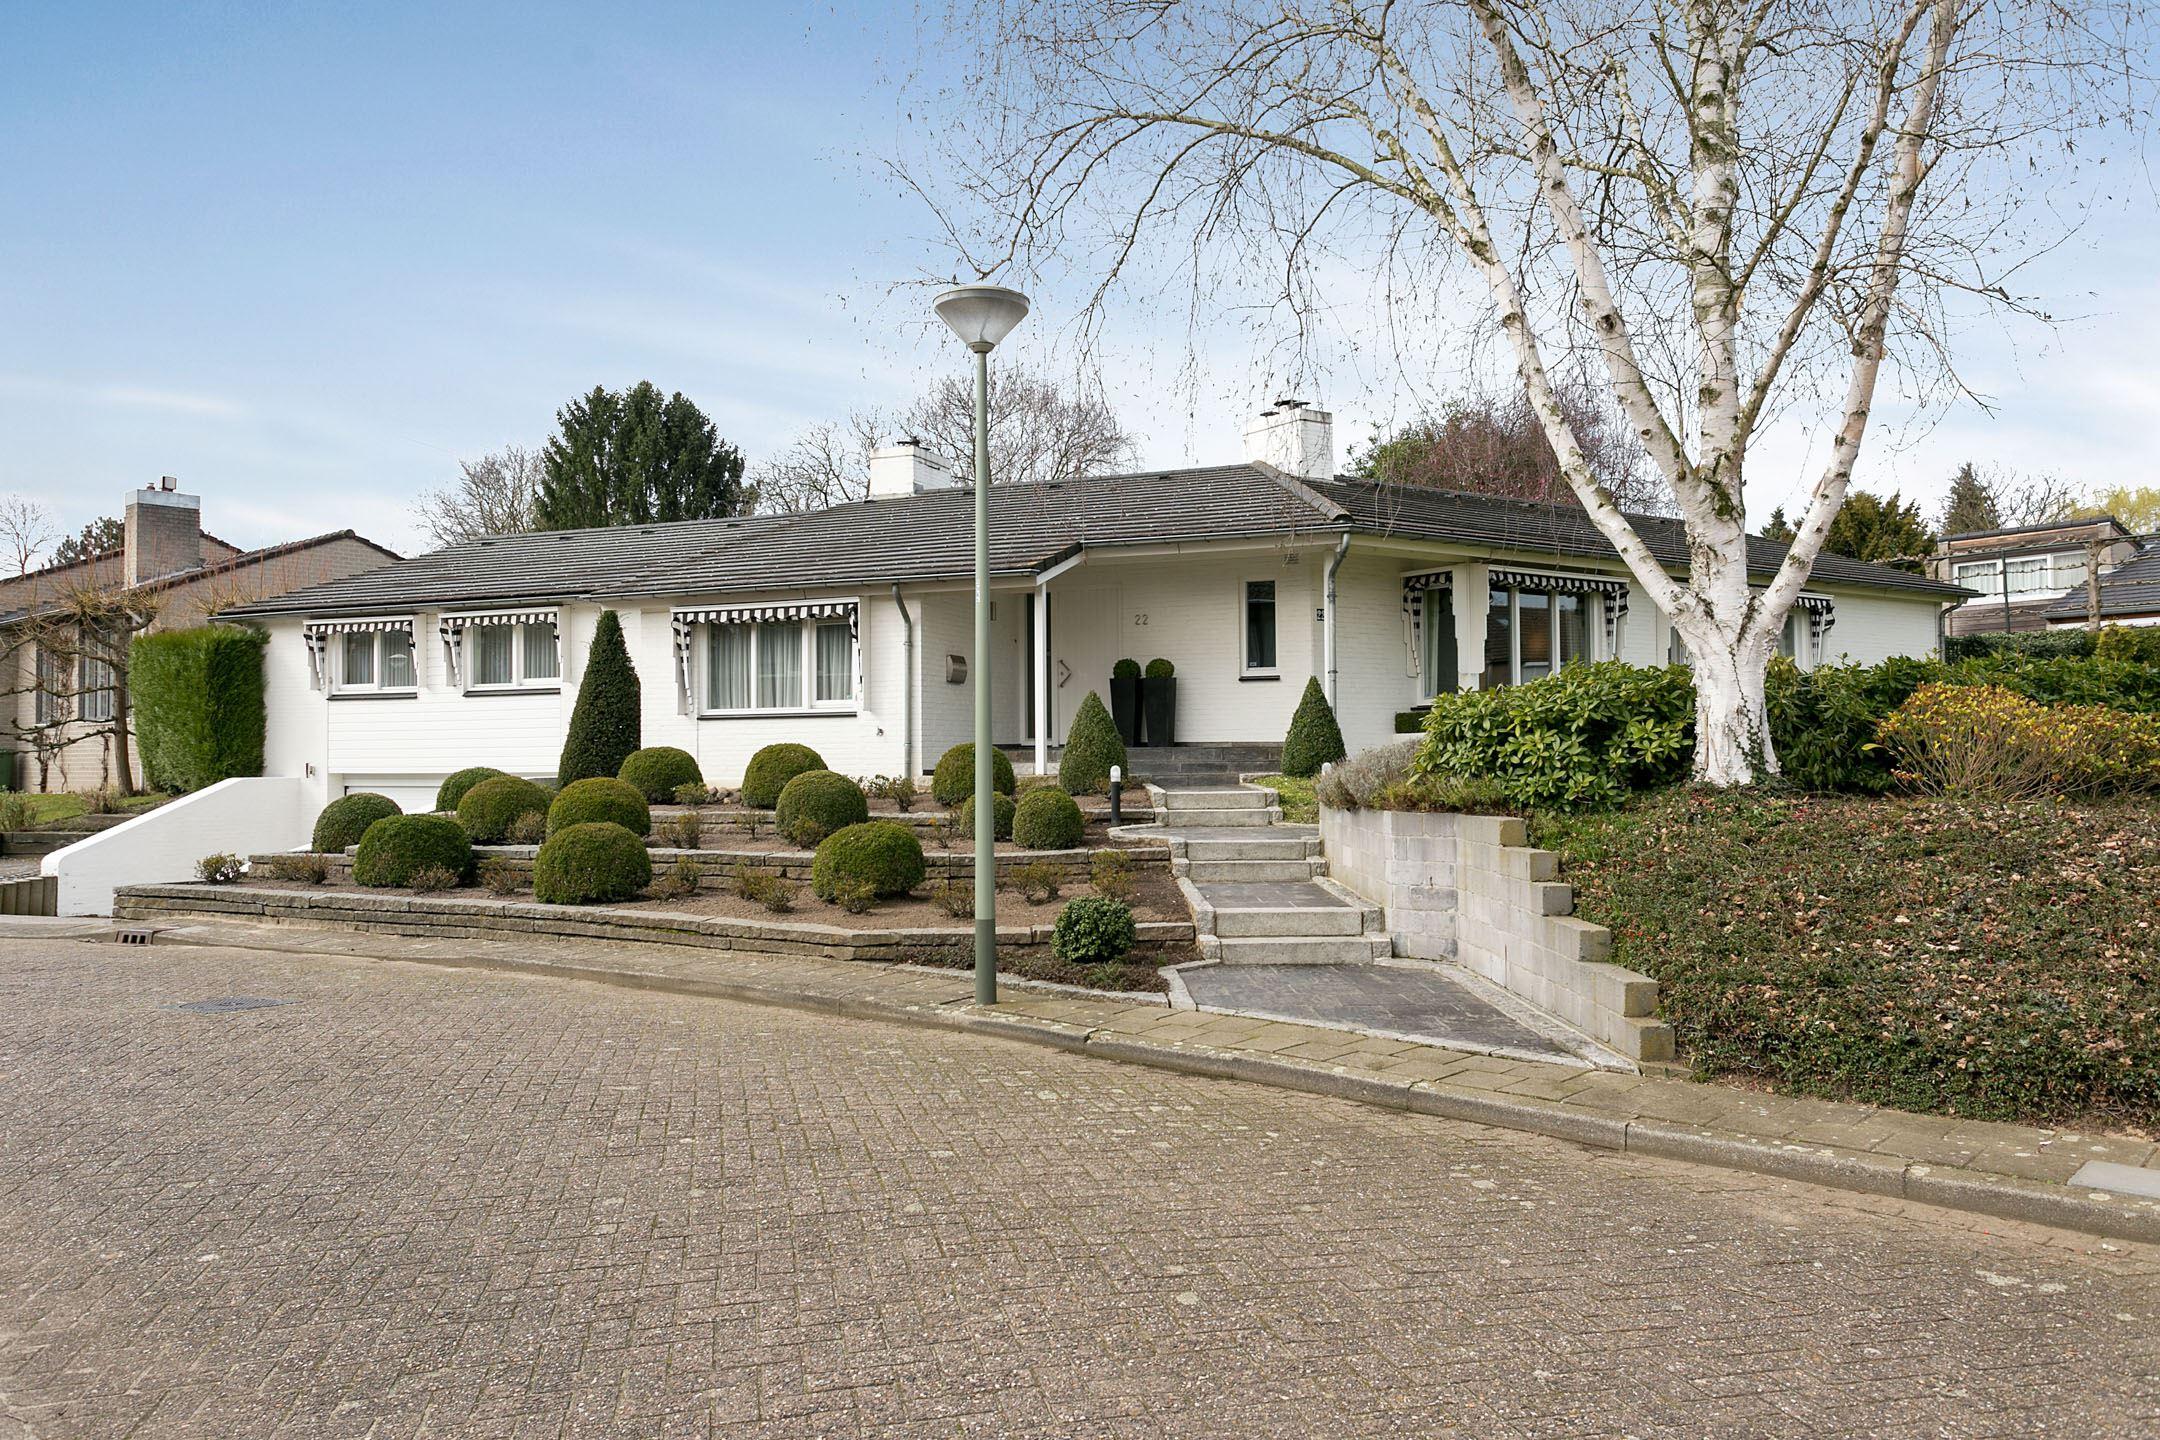 Huis te koop kruisbroedersweg 22 6041 pm roermond funda for Huis tuin roermond